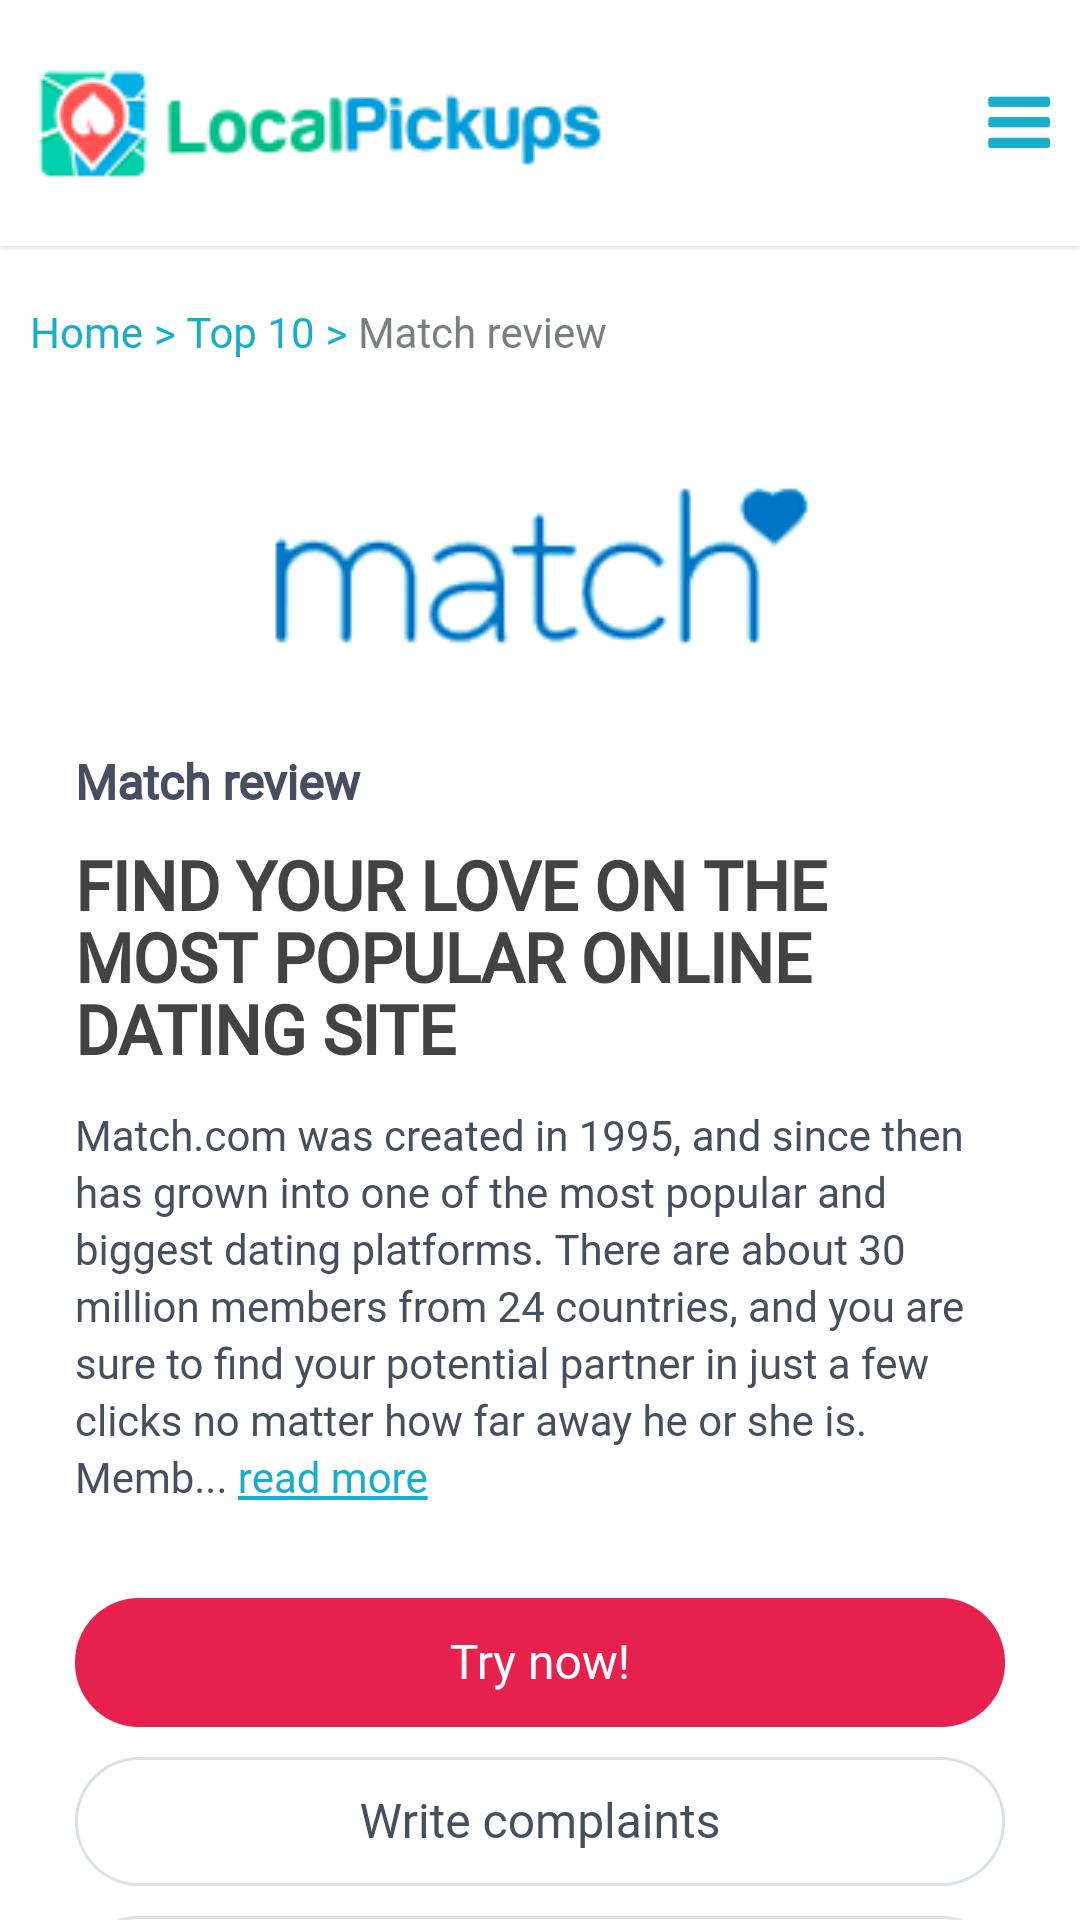 dating partners login ce fel de tip am dat seama